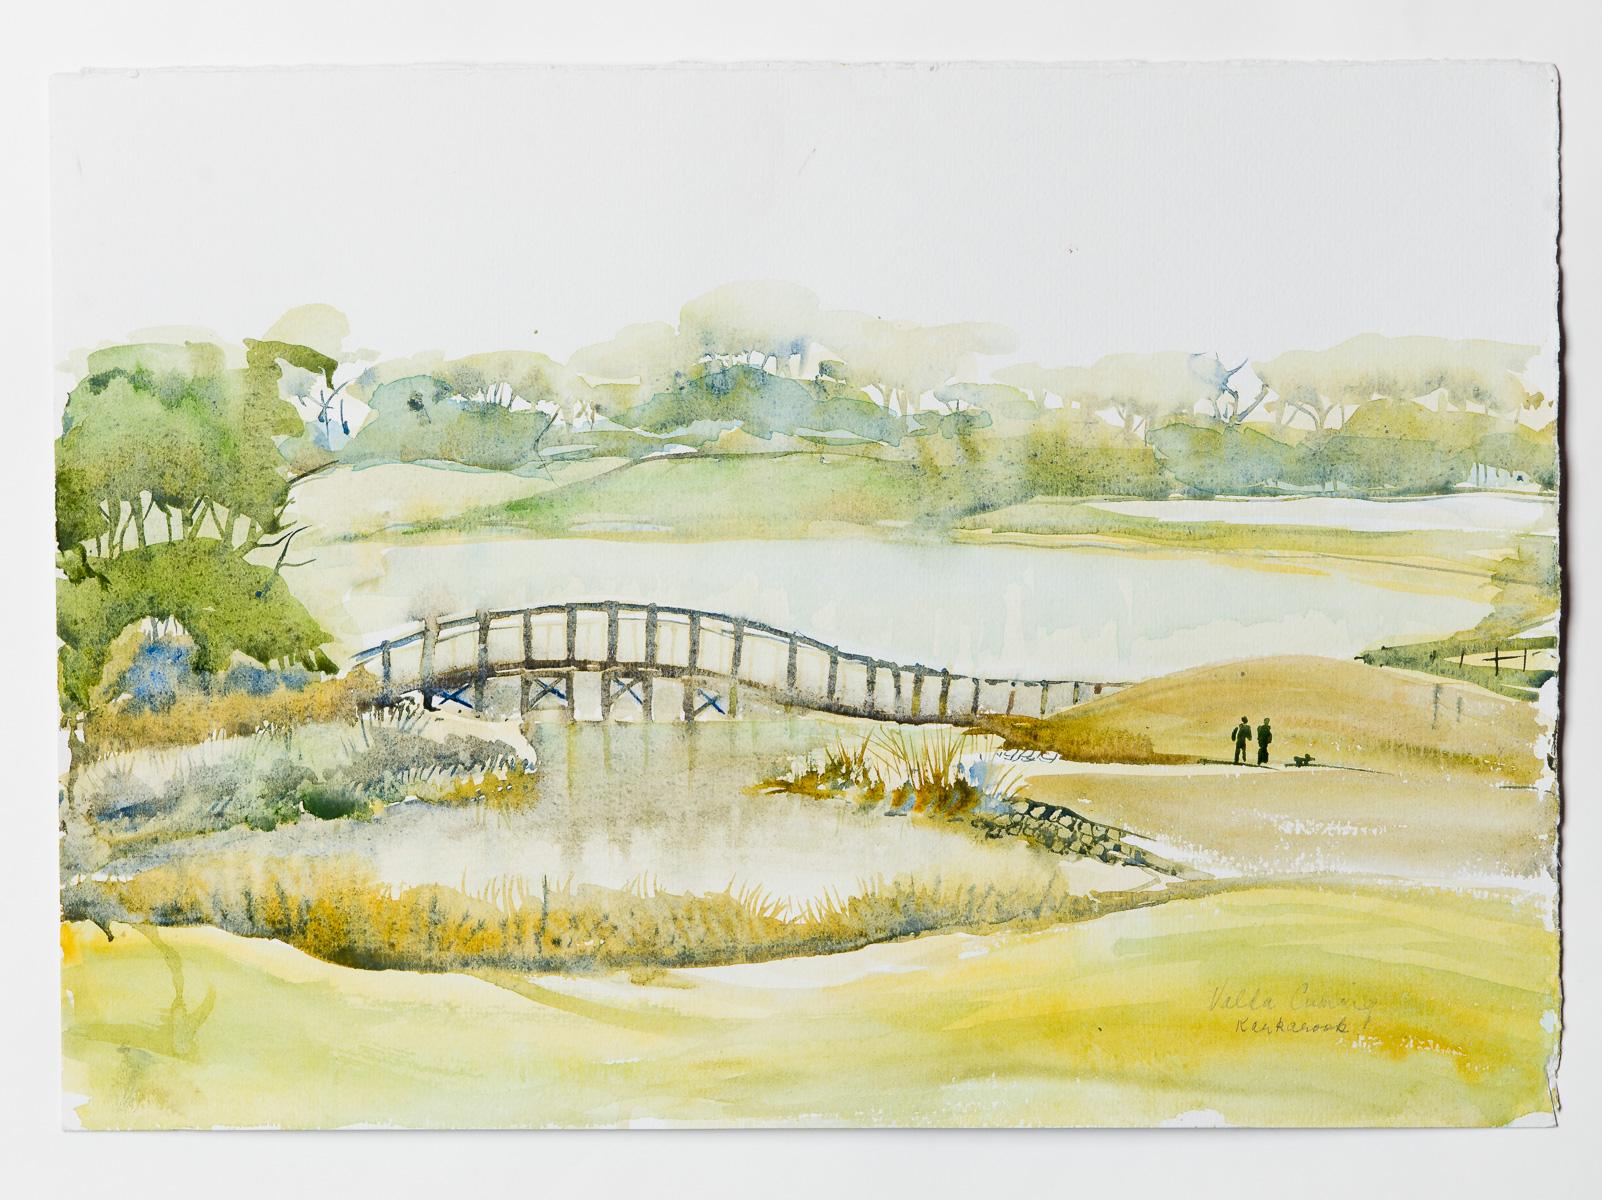 Karrarak Park